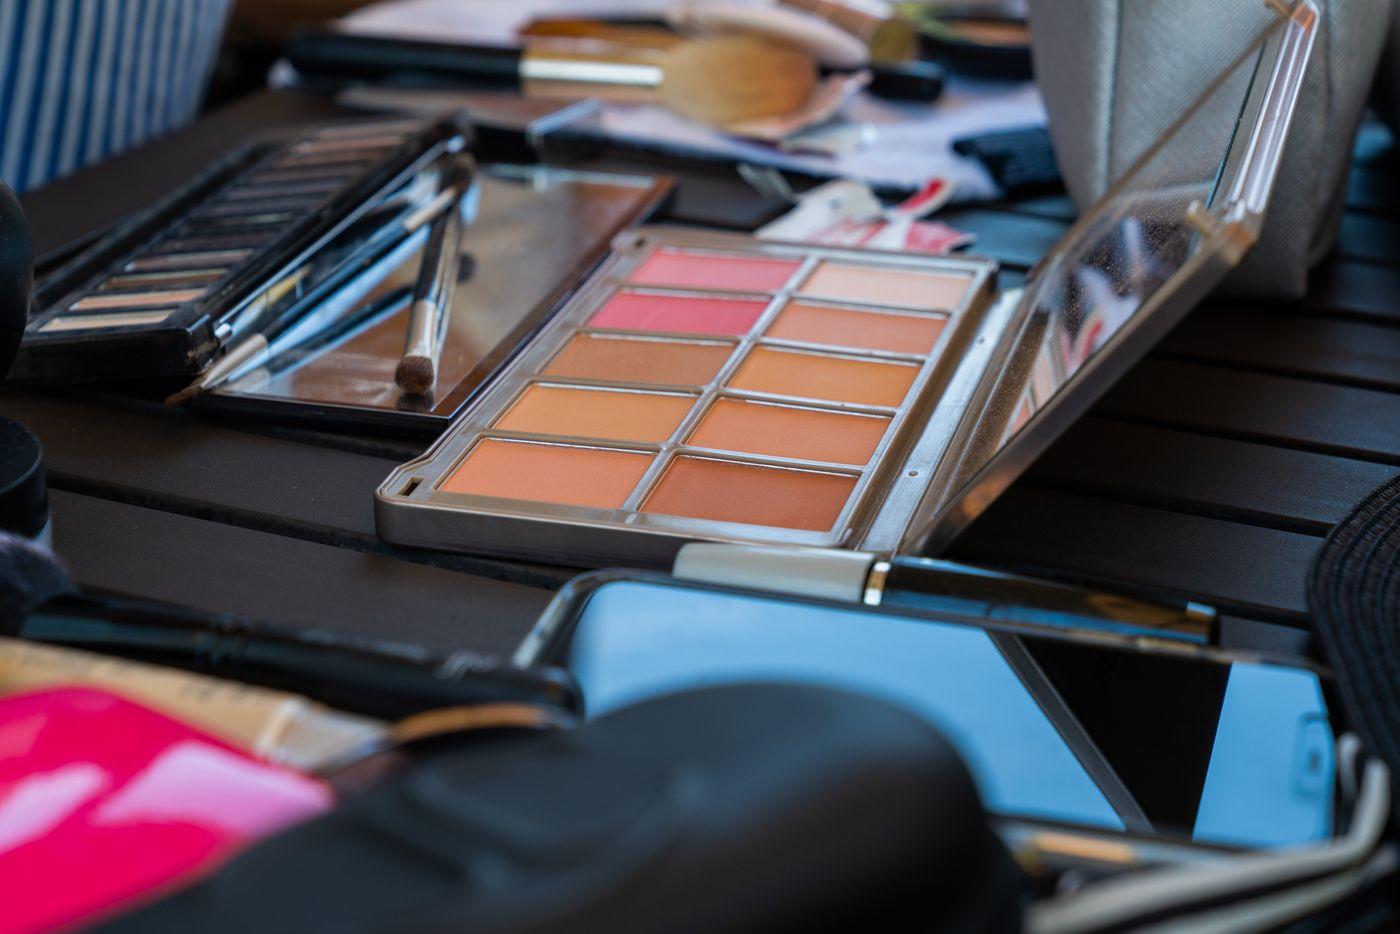 Cosmetics - A2_ASH3226.jpg